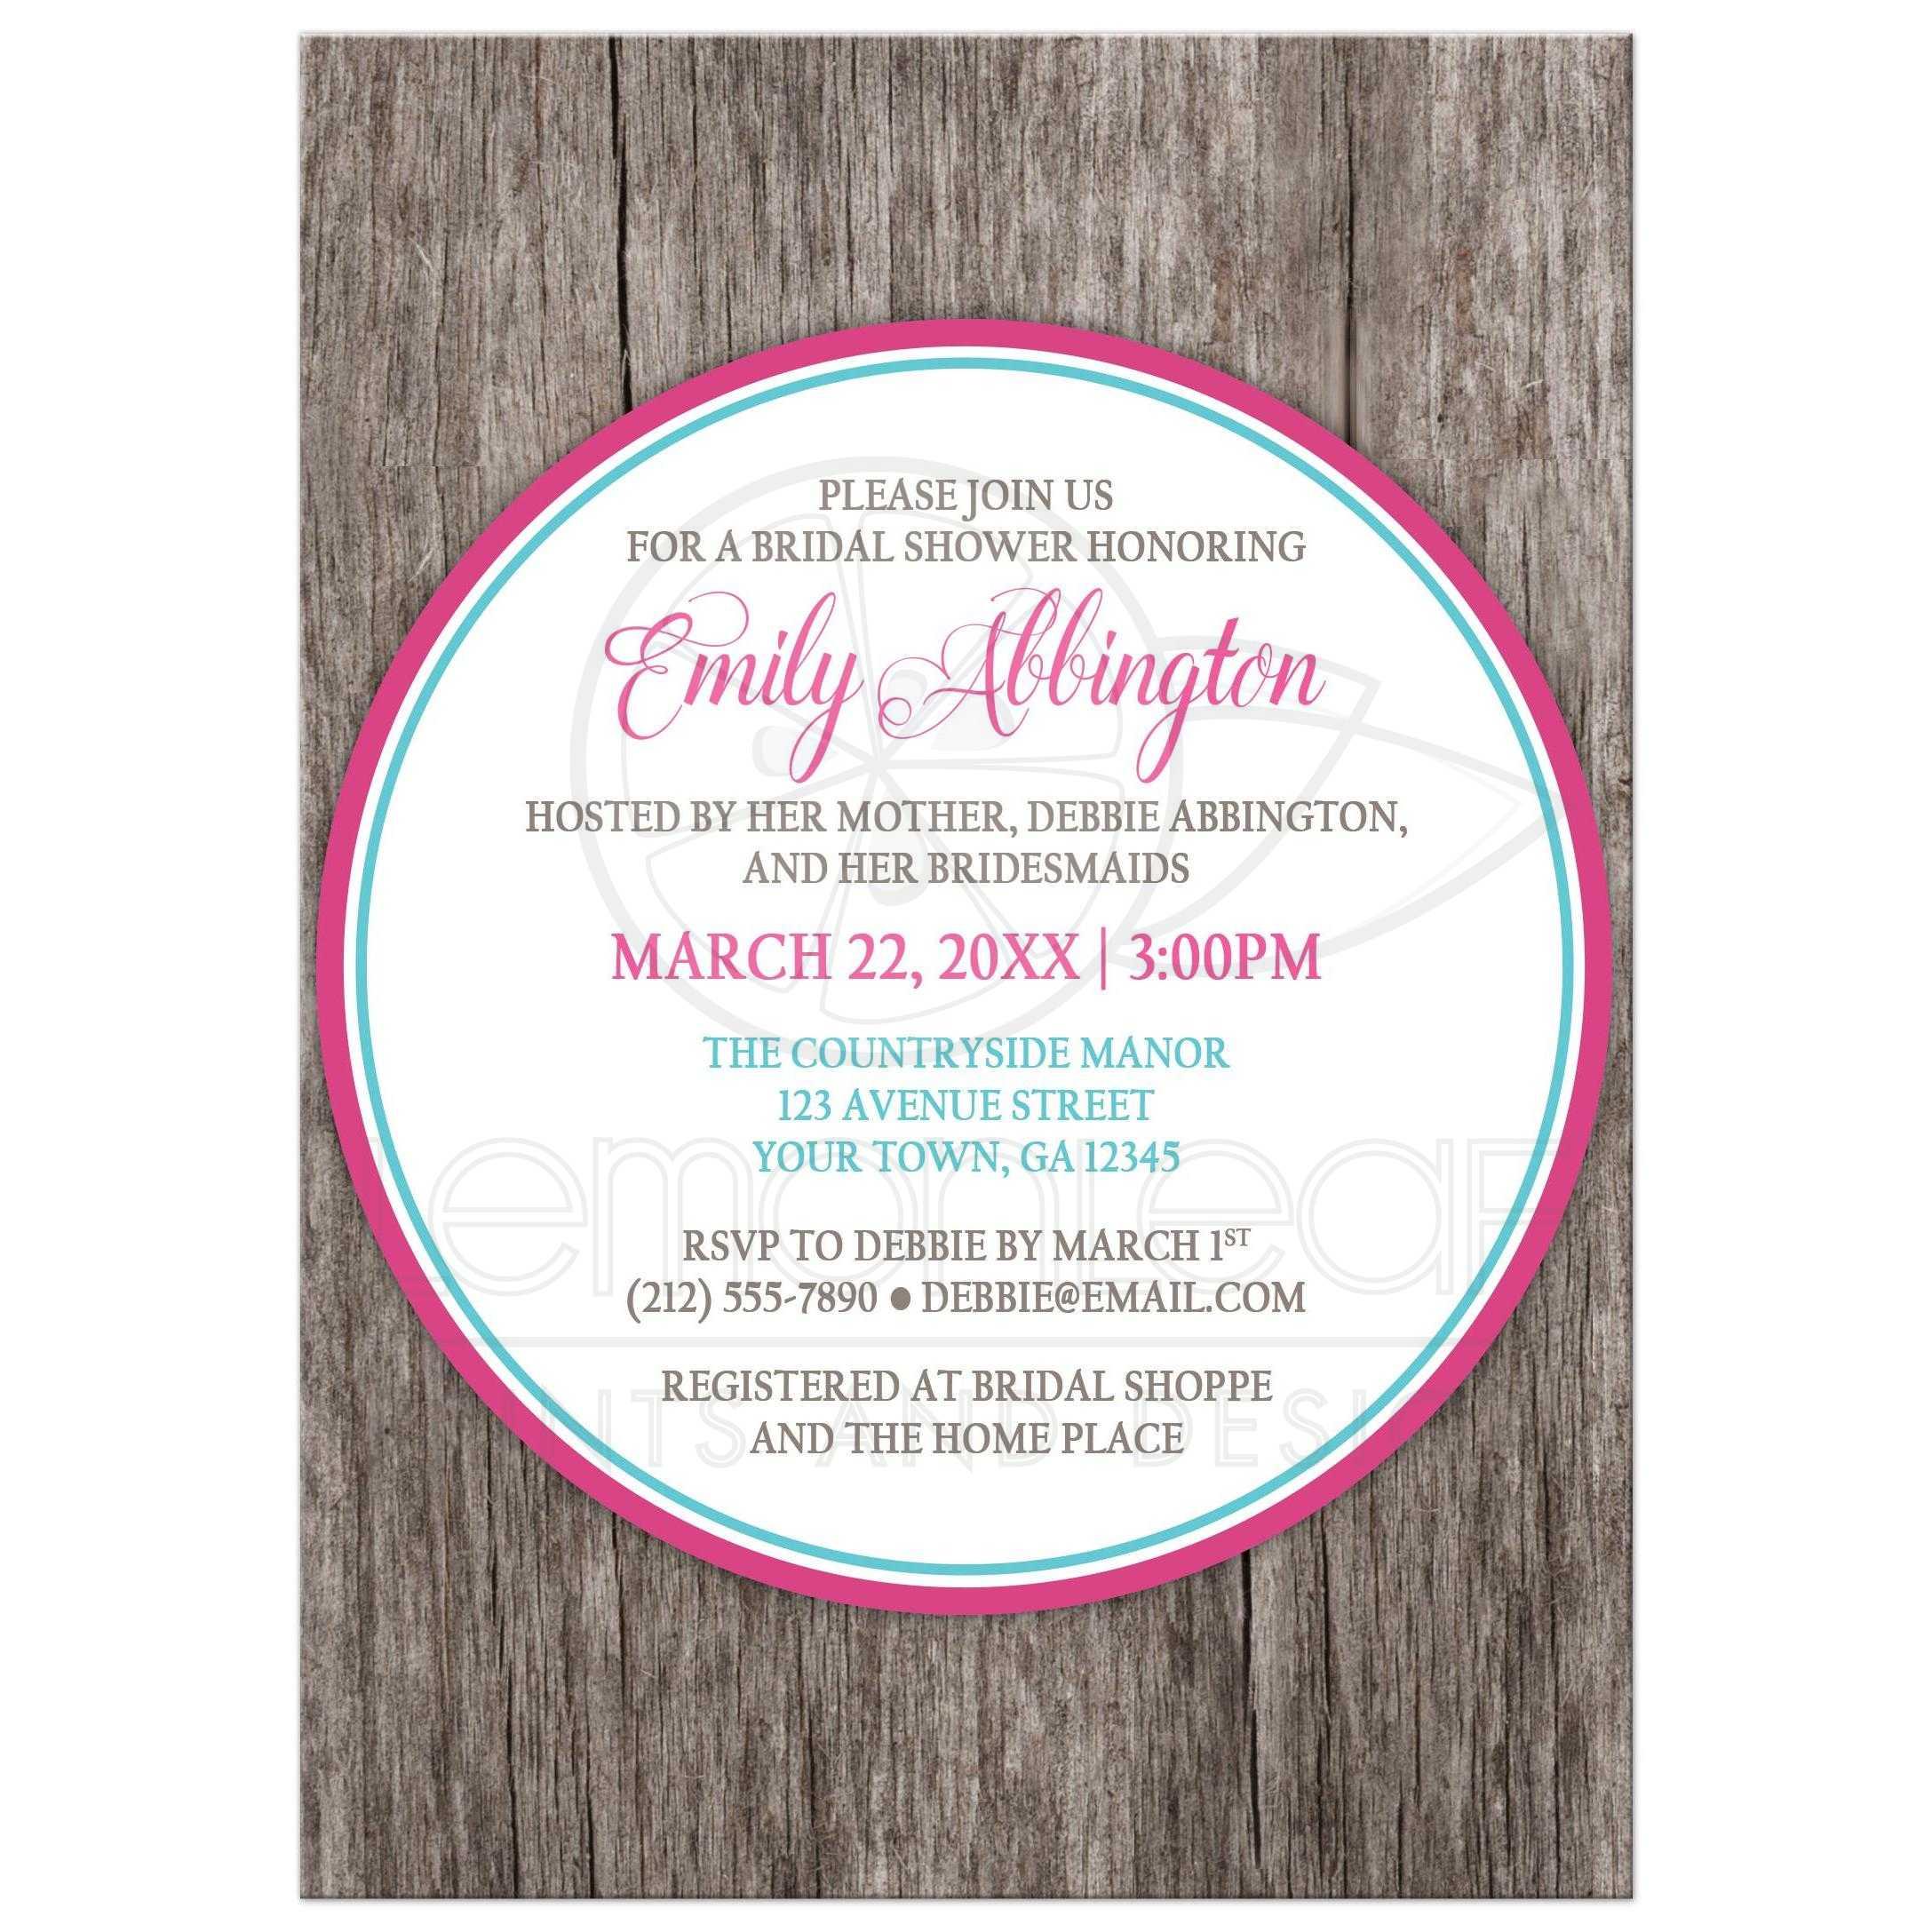 Bridal Shower Invitations - Fuchsia Pink Turquoise Rustic Wood